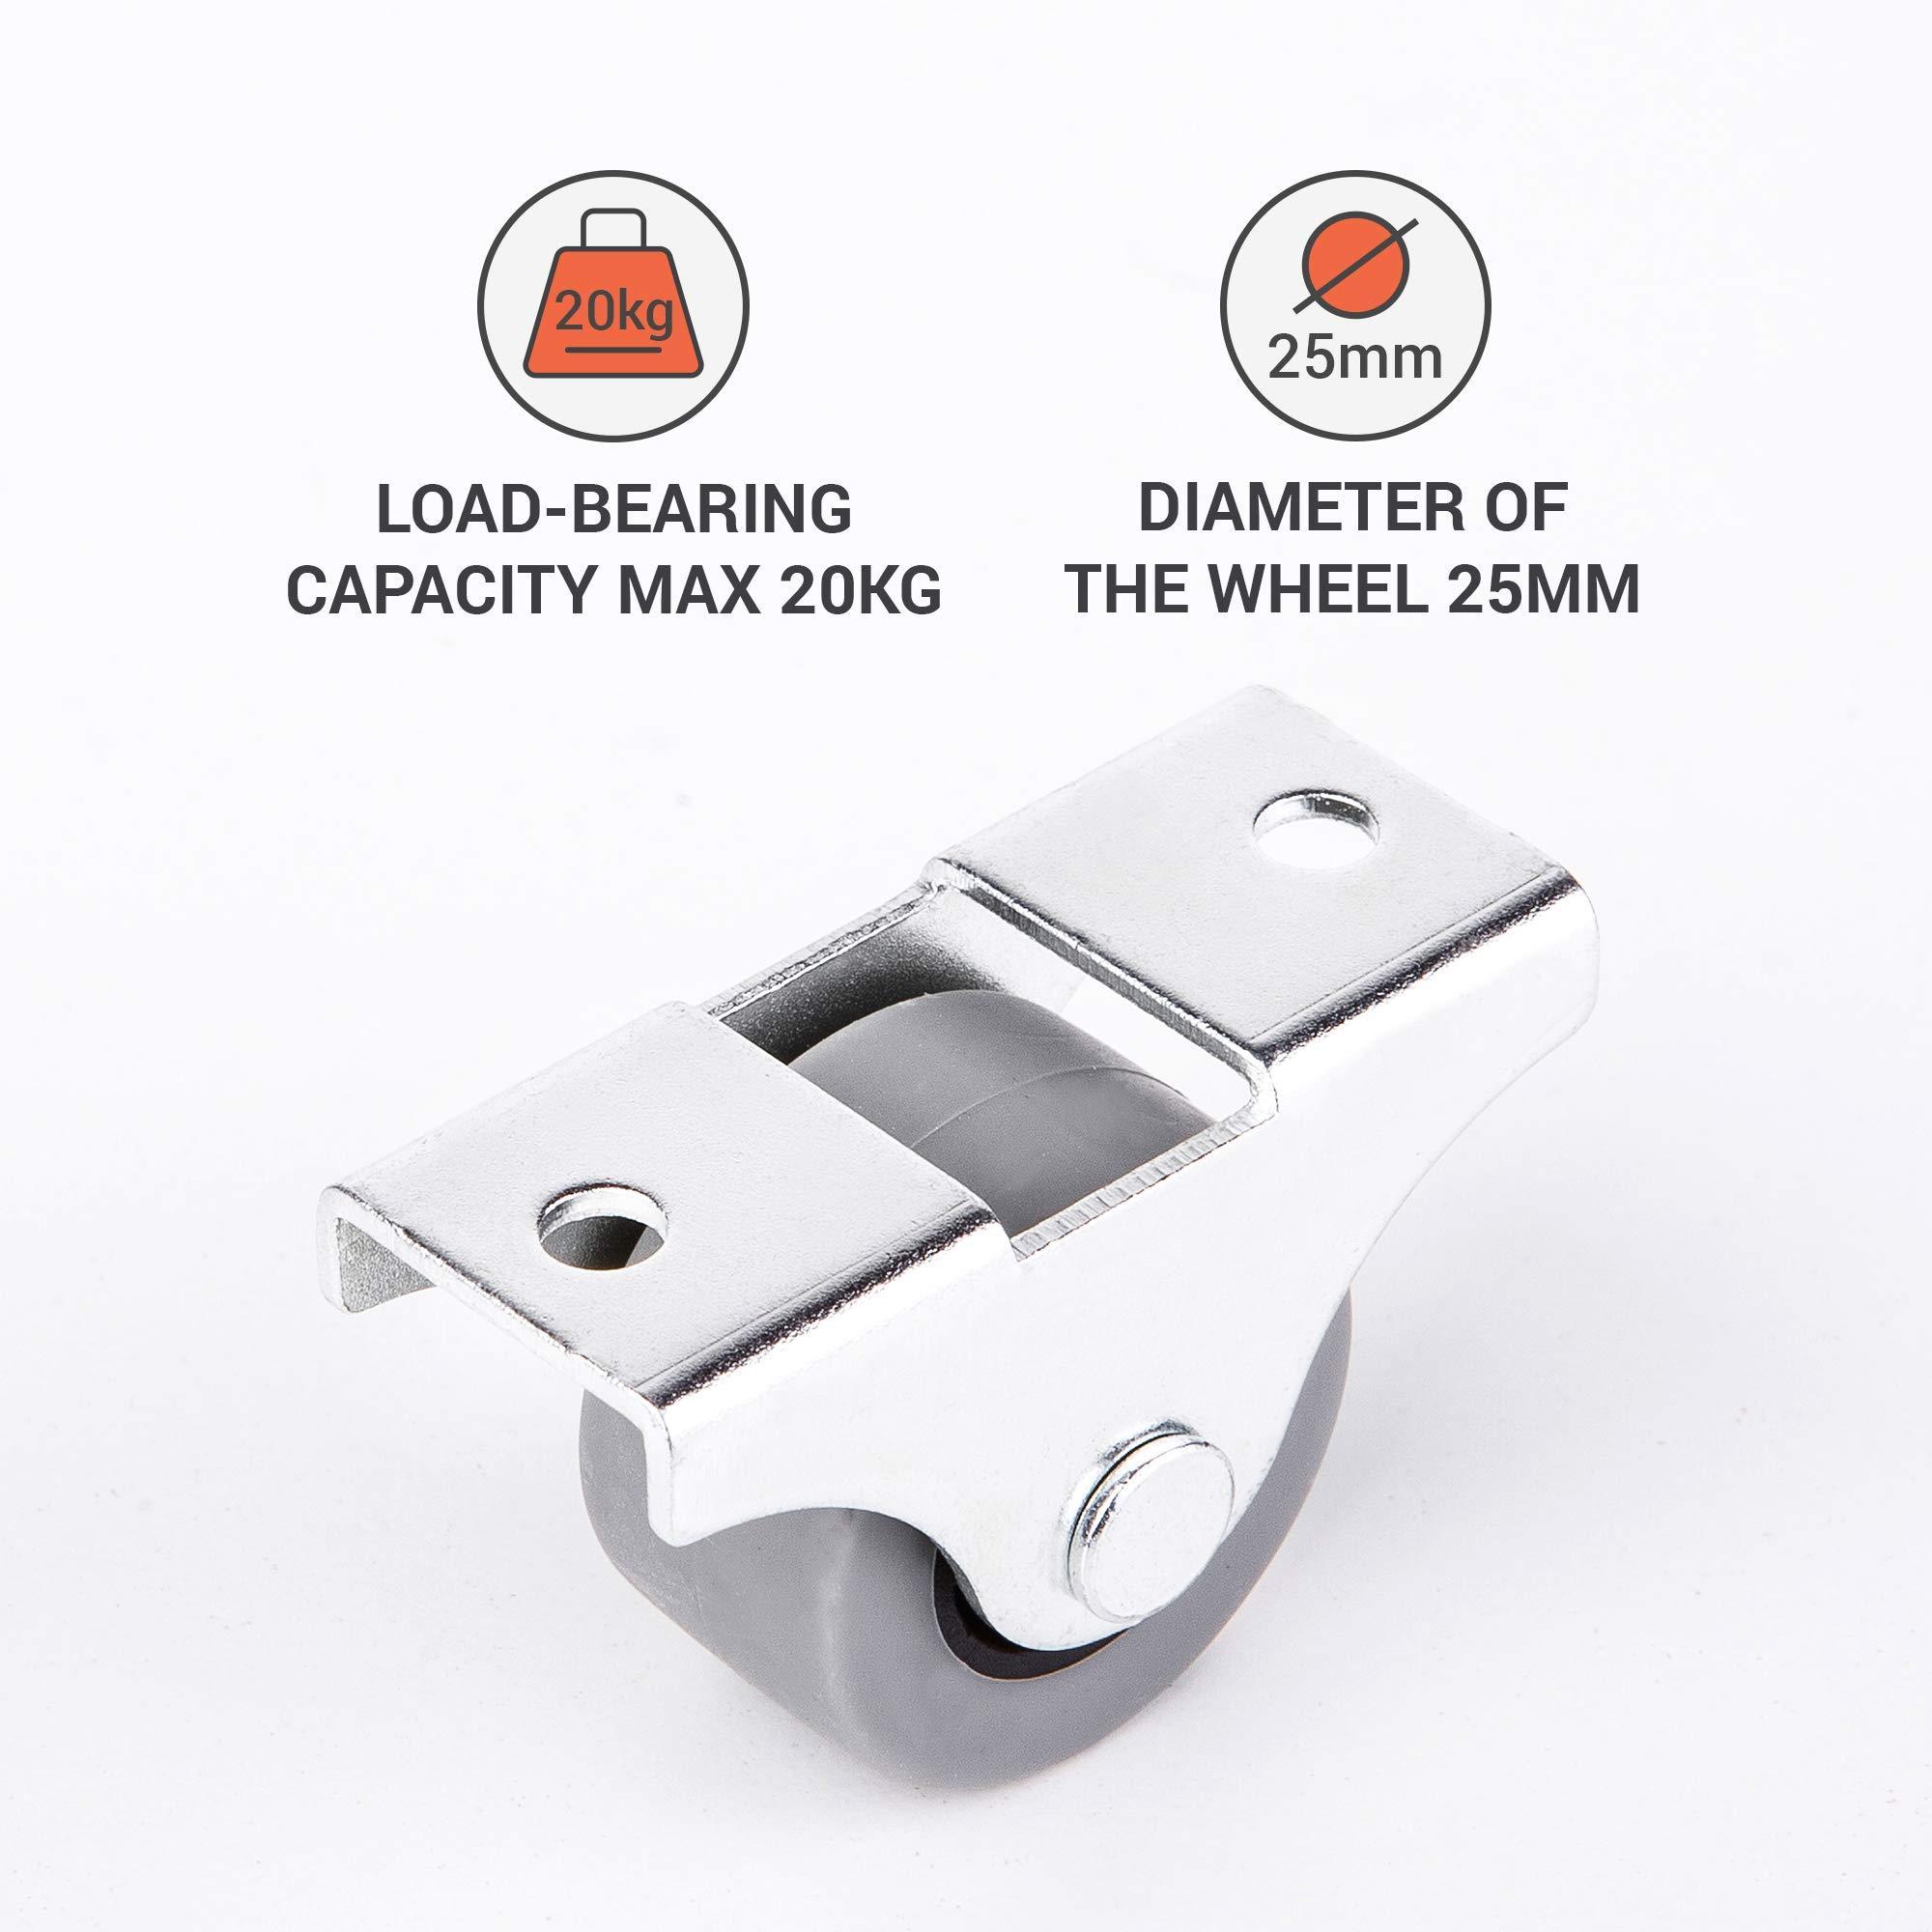 Pack of 8 25 mm Small Wheel Castors Rubber Casters Castors for Furniture Non-Swivel Small Wheels Non-Plastic Appliance /& Equipment Small Wheel Castors Screws Included Casters Set 8, ⌀25mm // 20kg